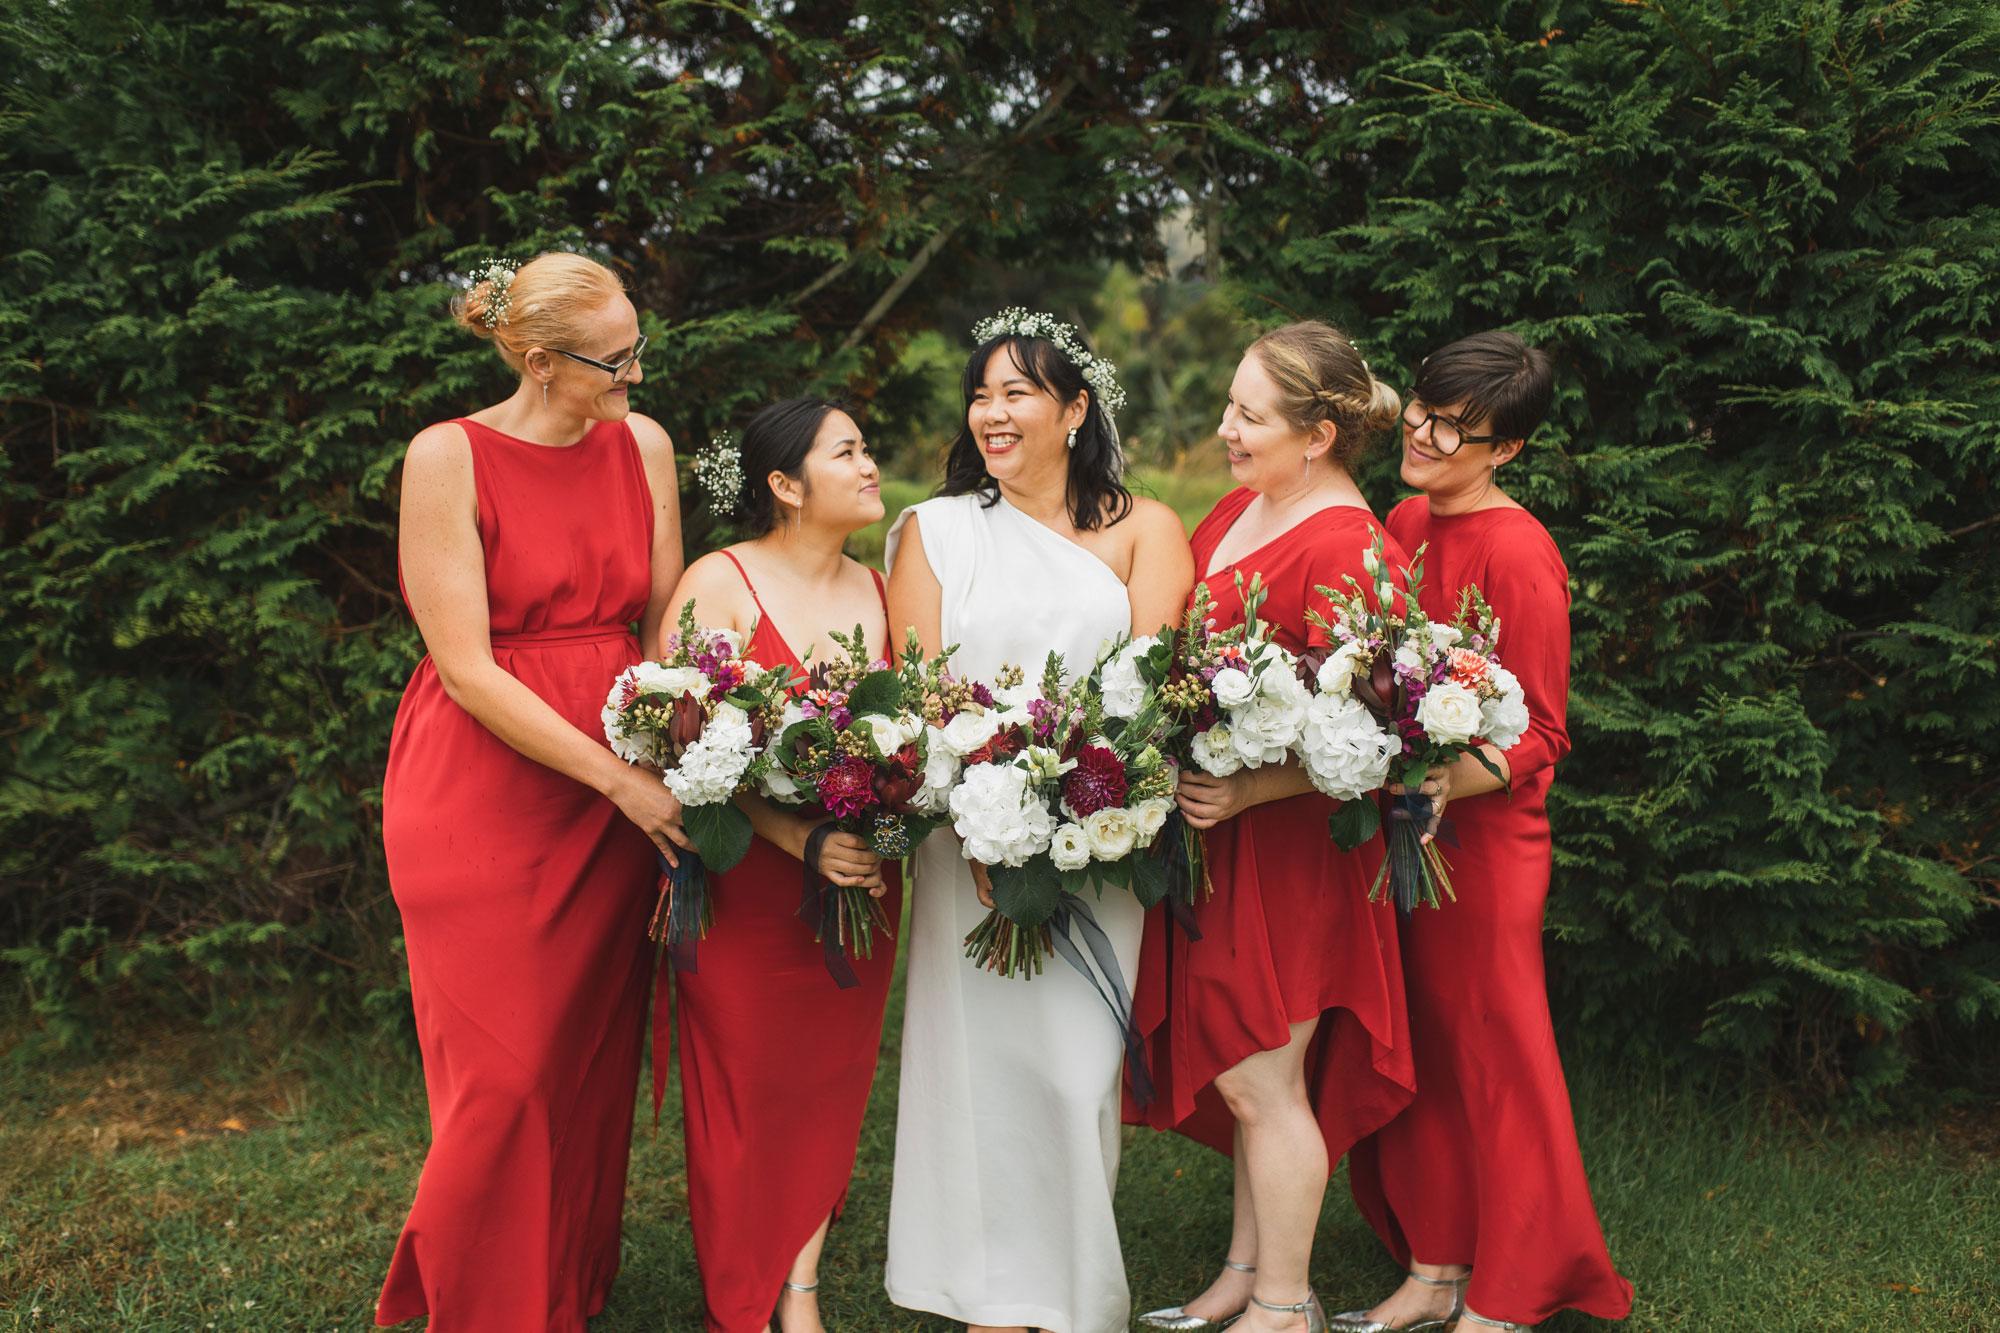 auckland wedding bridal party photo